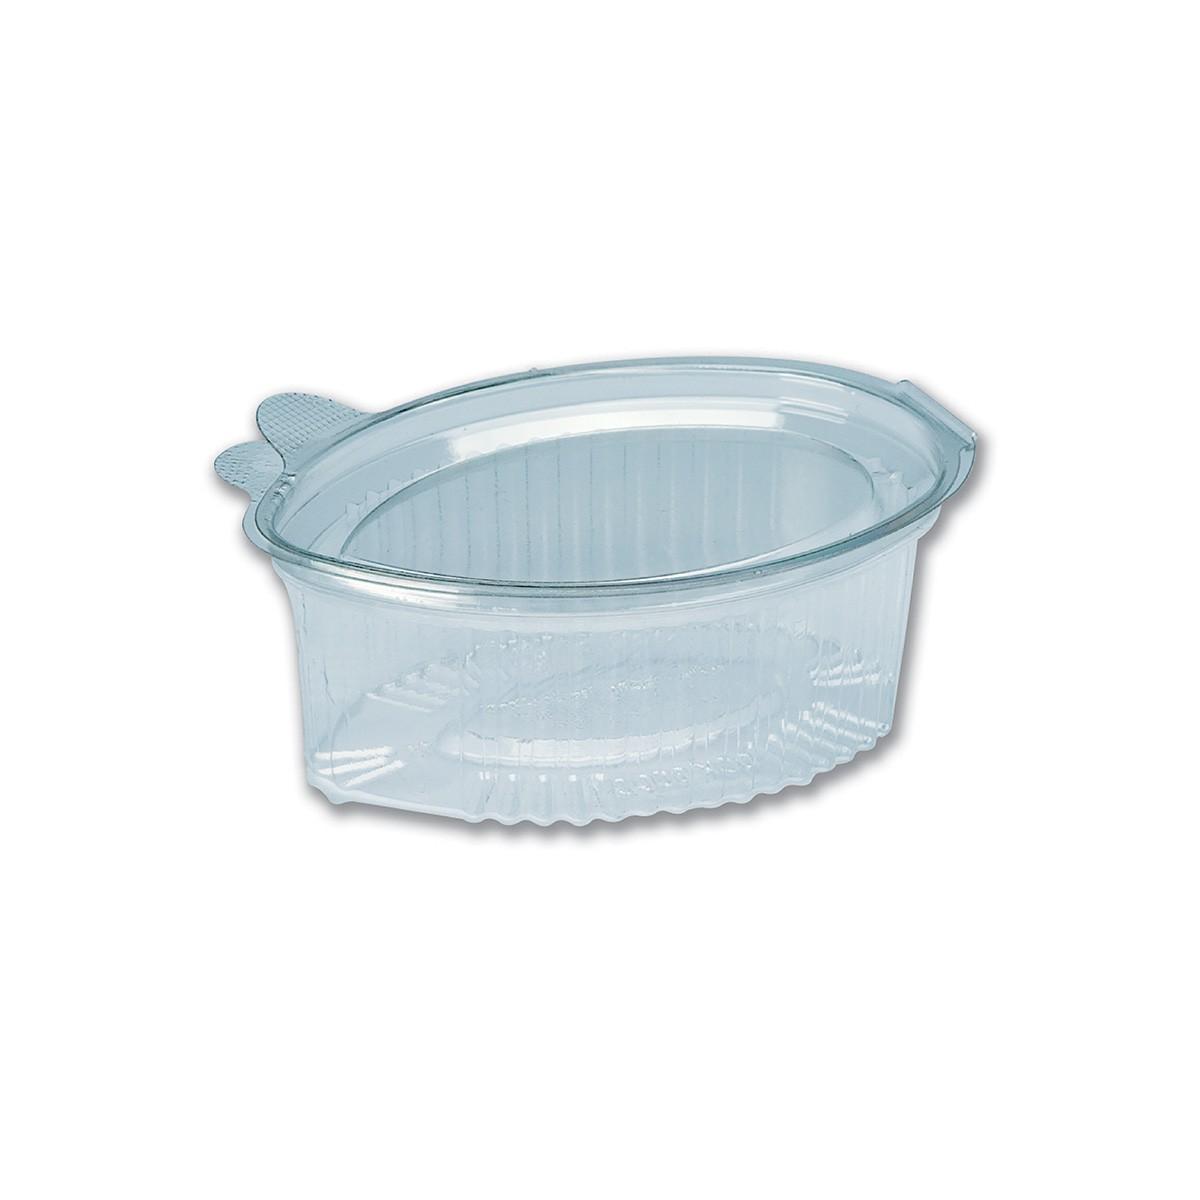 Tinypac Clear Leaf-Shaped Portion Cup w/ Lid 100cc | 1000pcs